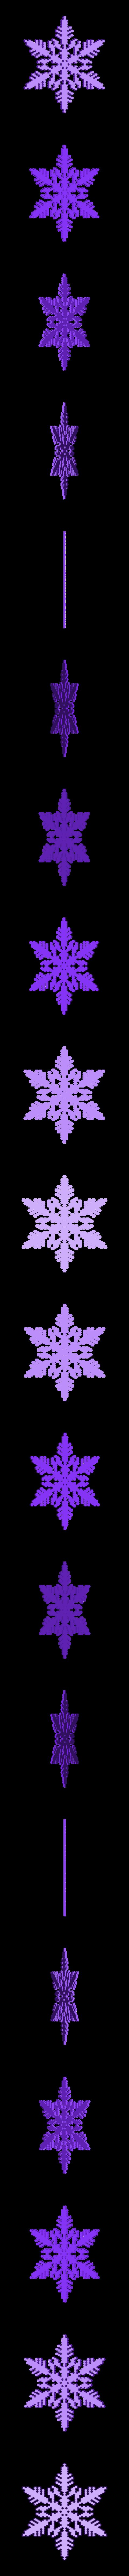 reiter-var5.stl Download free STL file Snowflake growth simulation in BlocksCAD • 3D printing design, arpruss